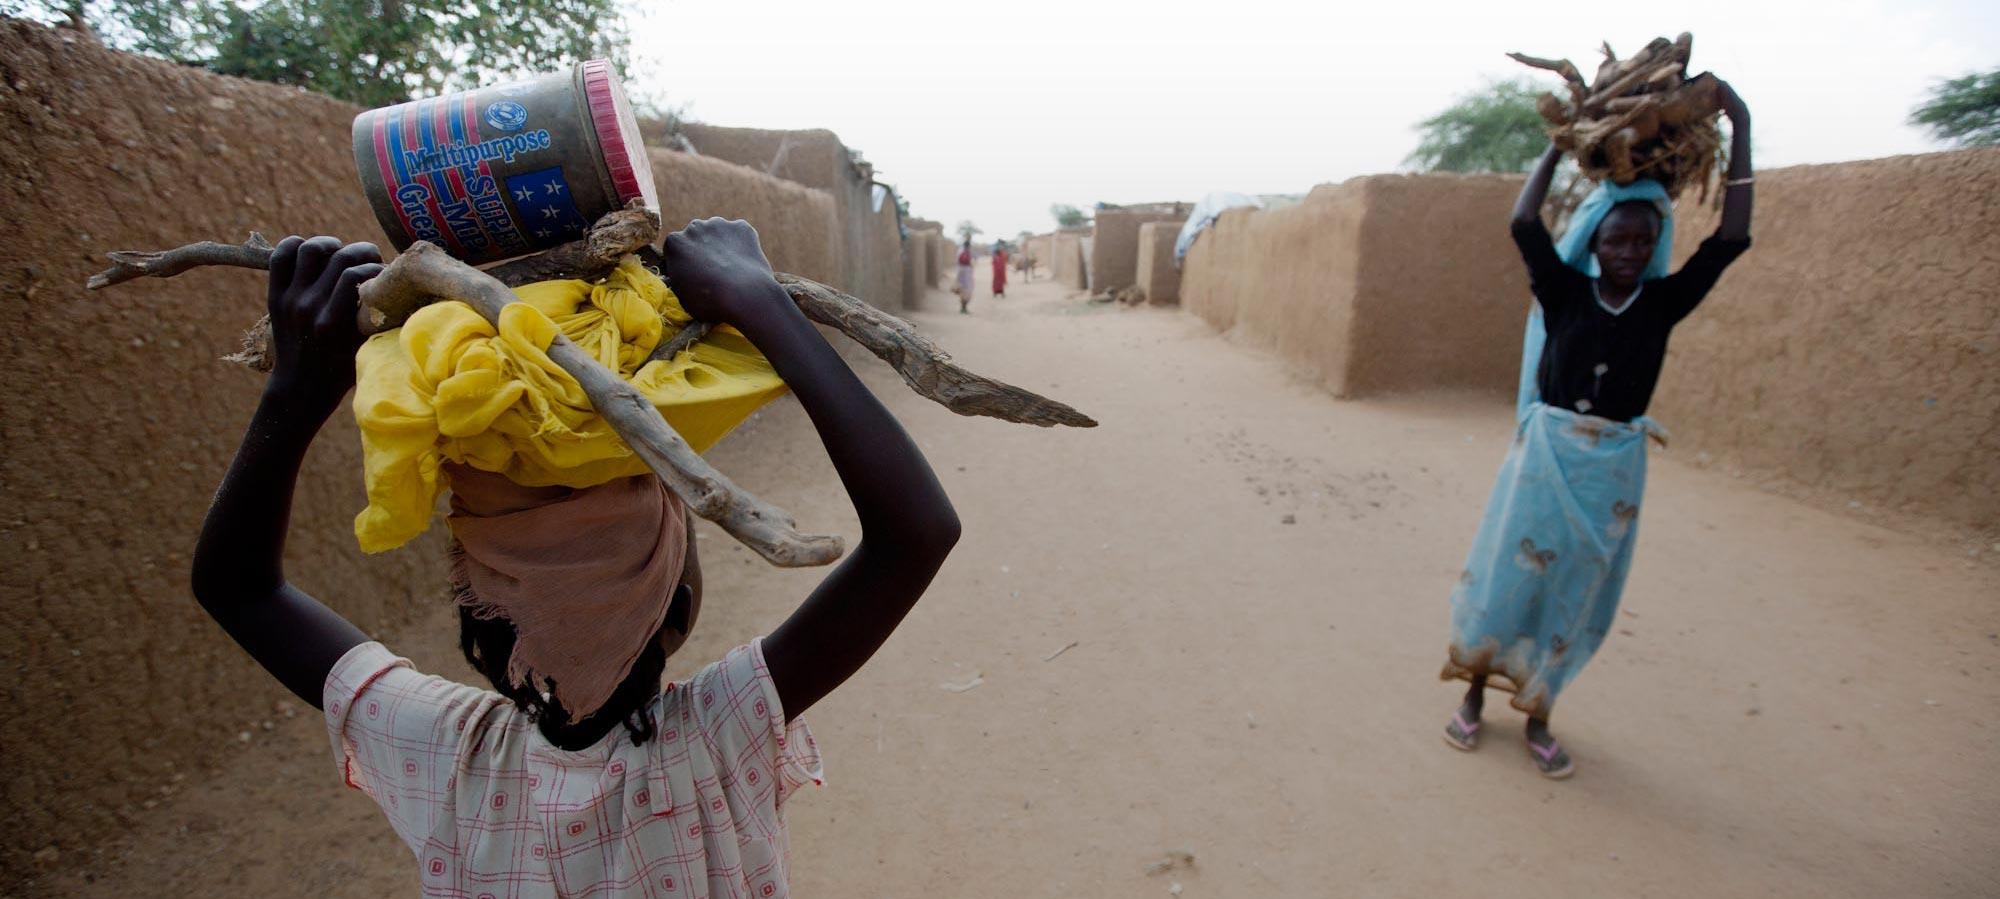 Internally displaced people return to Kassab camp, North Darfur. Photo: UNAMID (flickr)